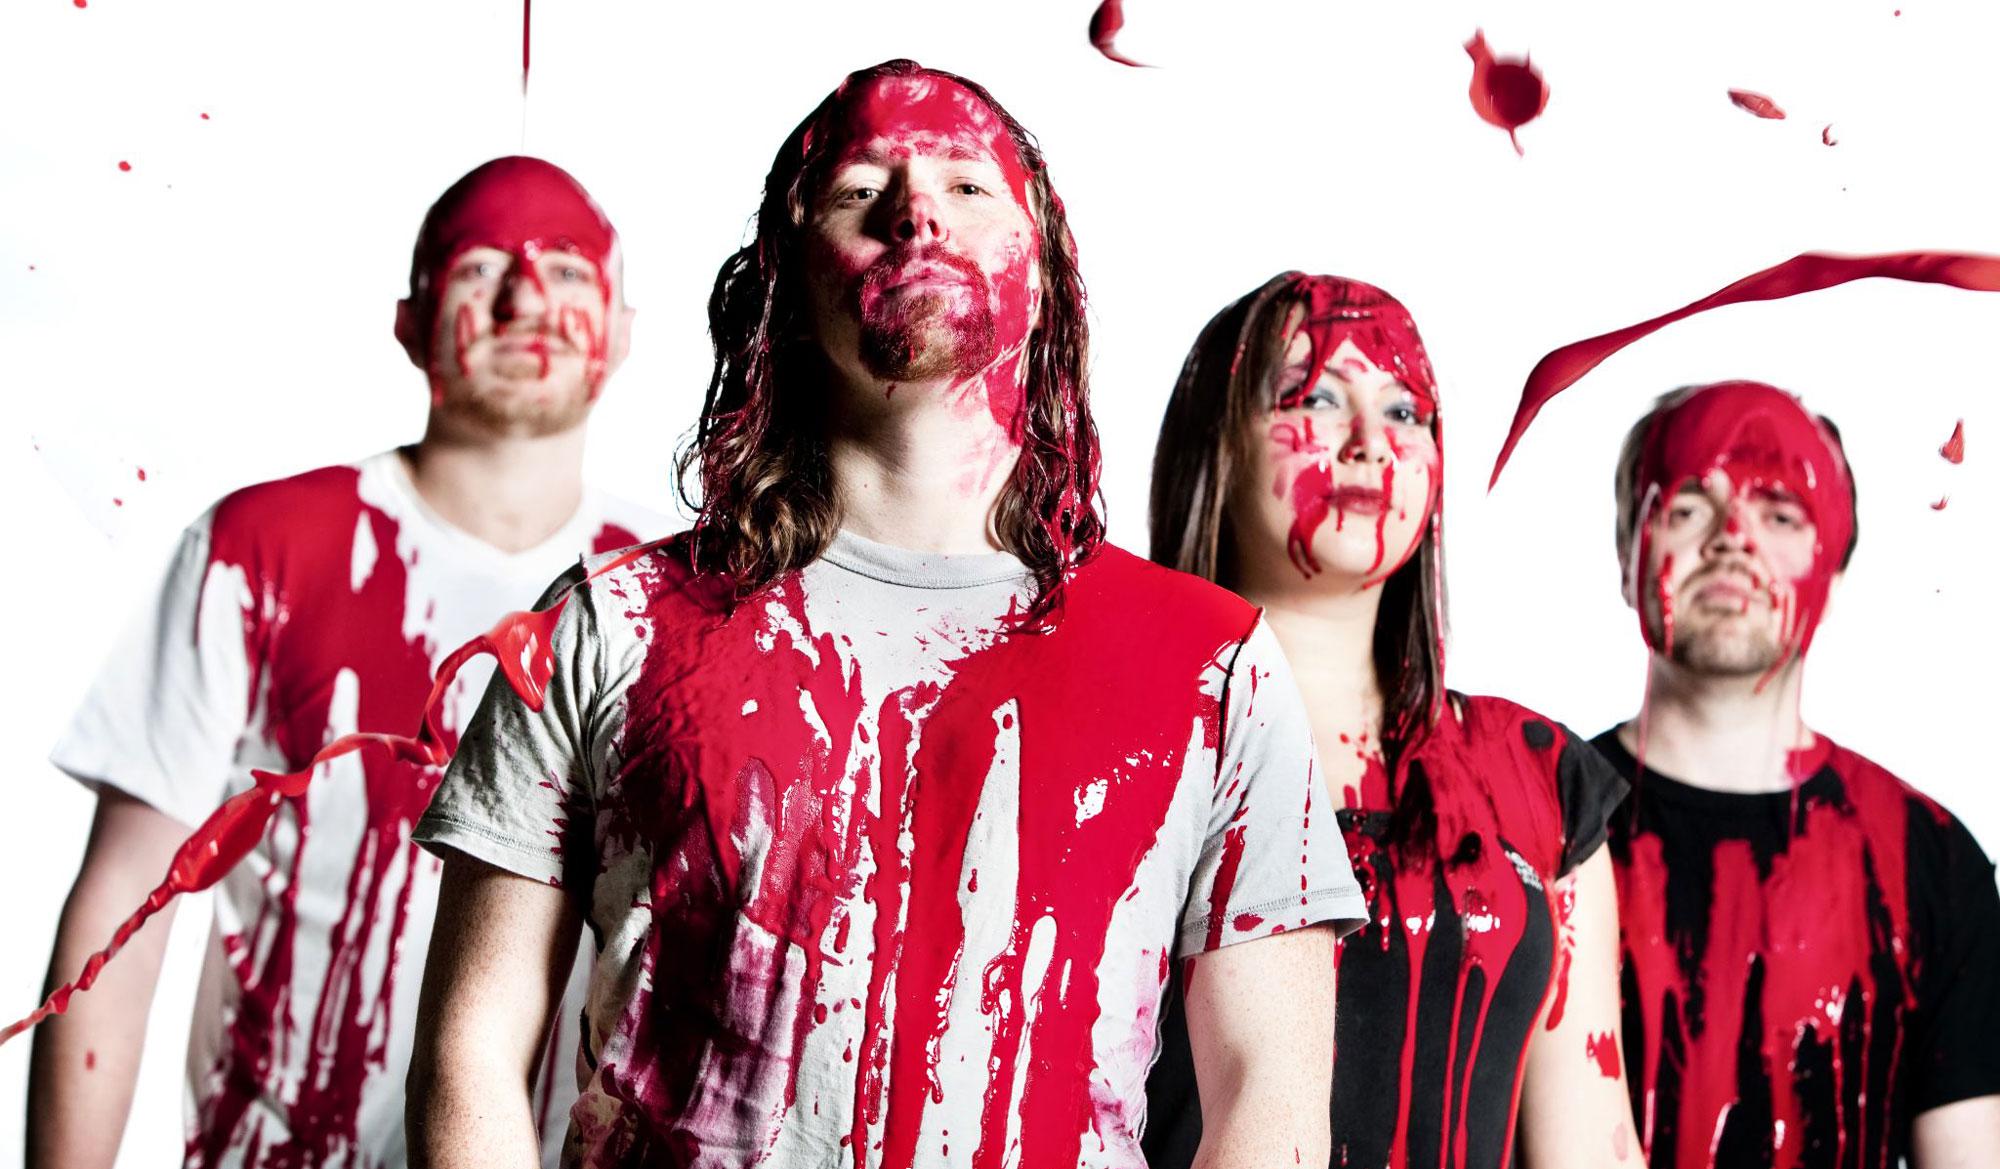 The Bloodpoets